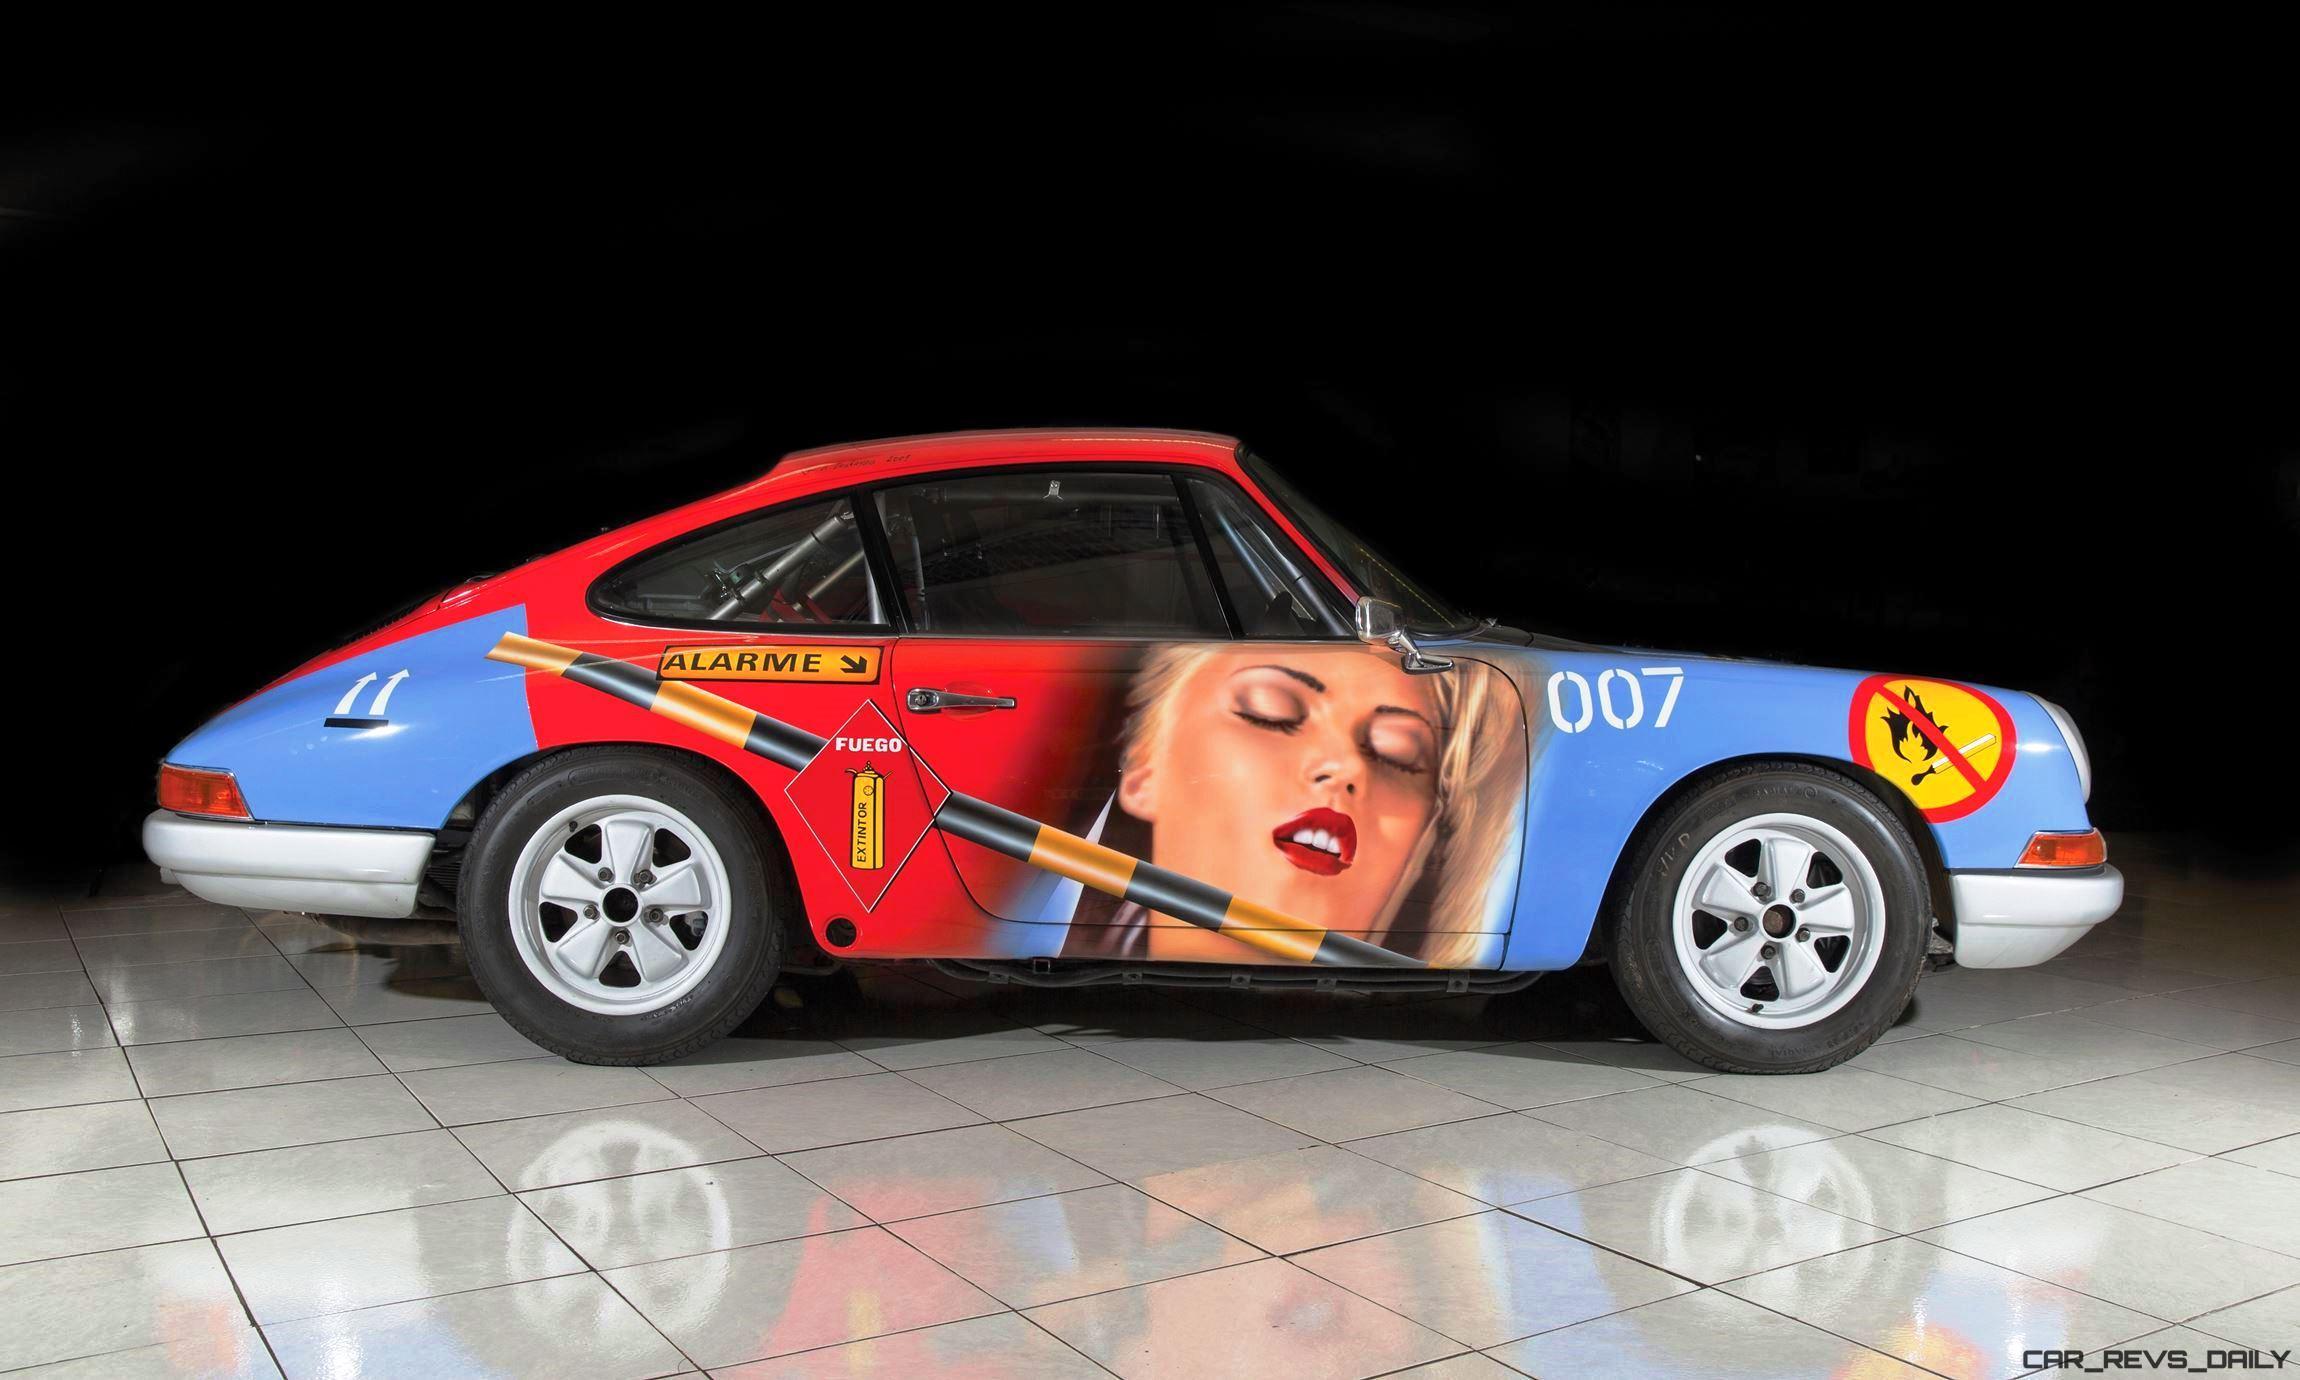 Rm Monaco 2016 1965 Porsche 911 Art Car 007 By Peter Klasen Car